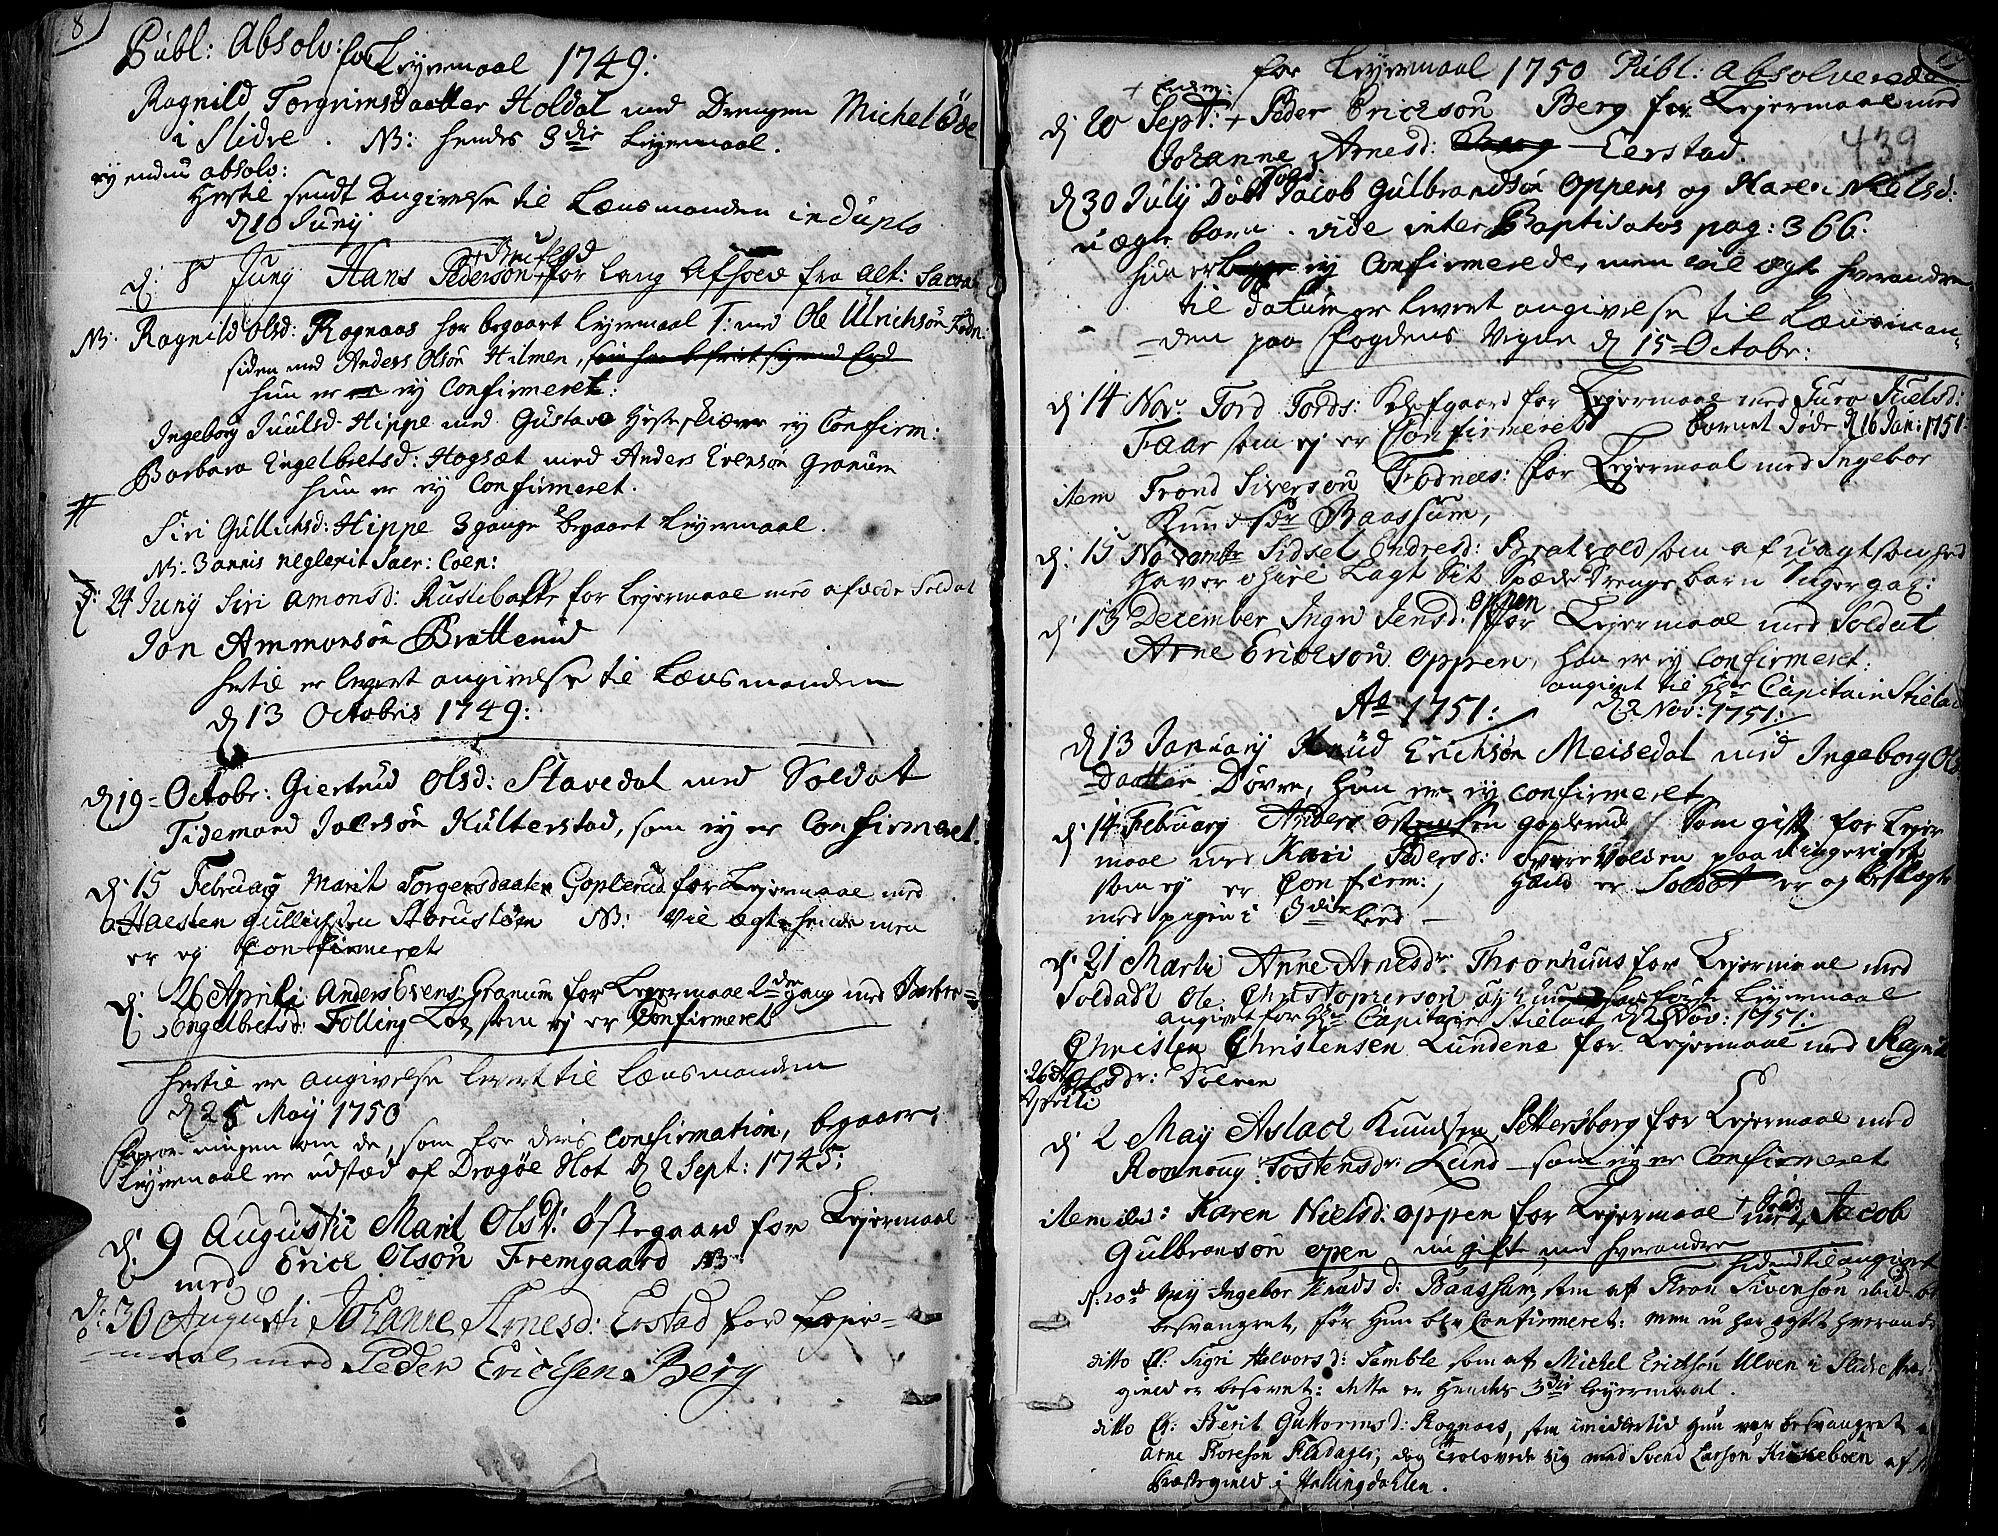 SAH, Aurdal prestekontor, Ministerialbok nr. 4, 1730-1762, s. 18-19